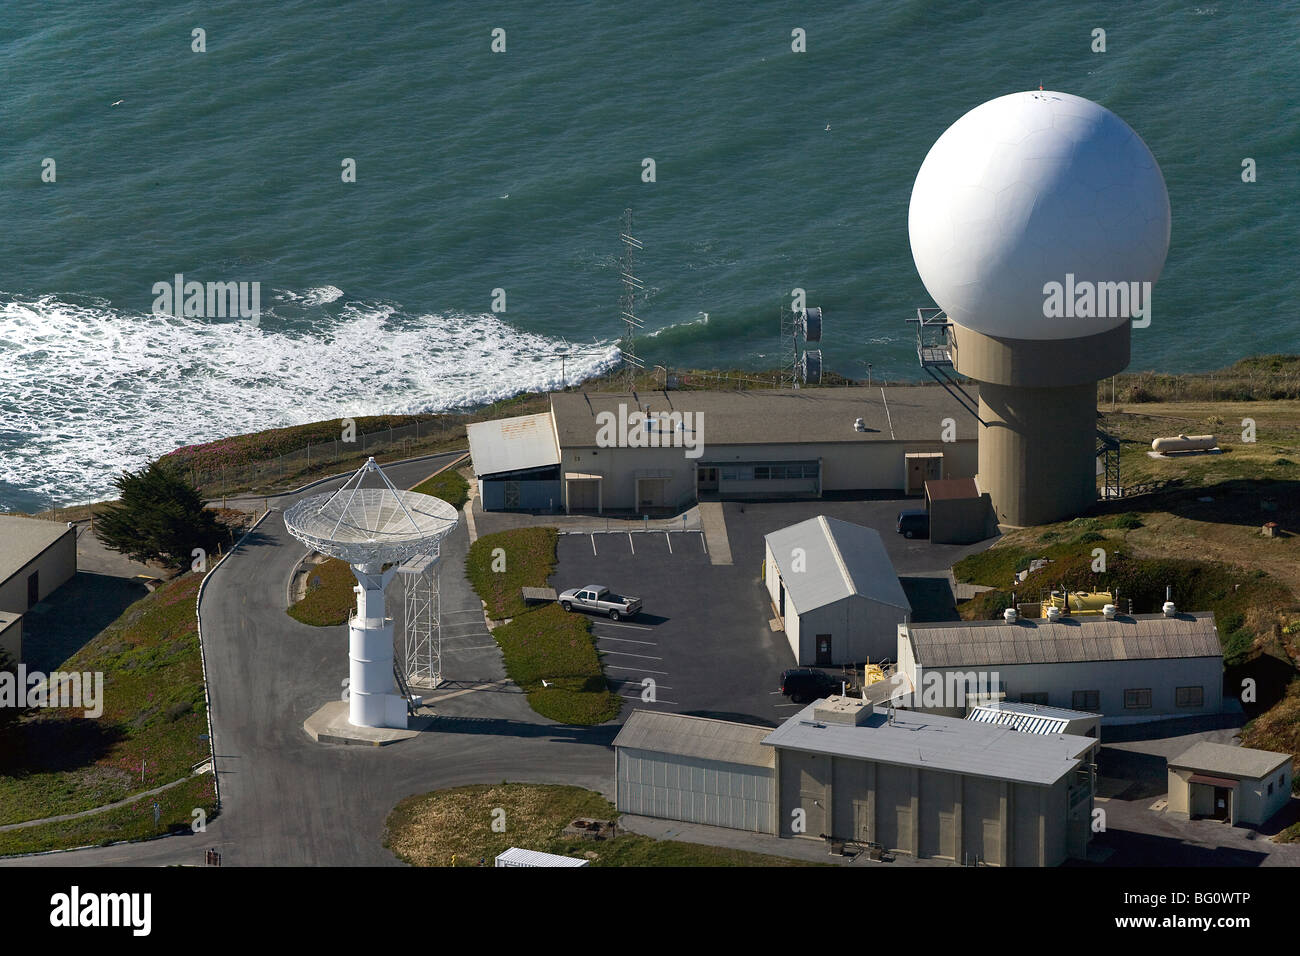 Luftaufnahme über Säule Punkt Air Force Tracking Station Half Moon Bay, Kalifornien Stockbild